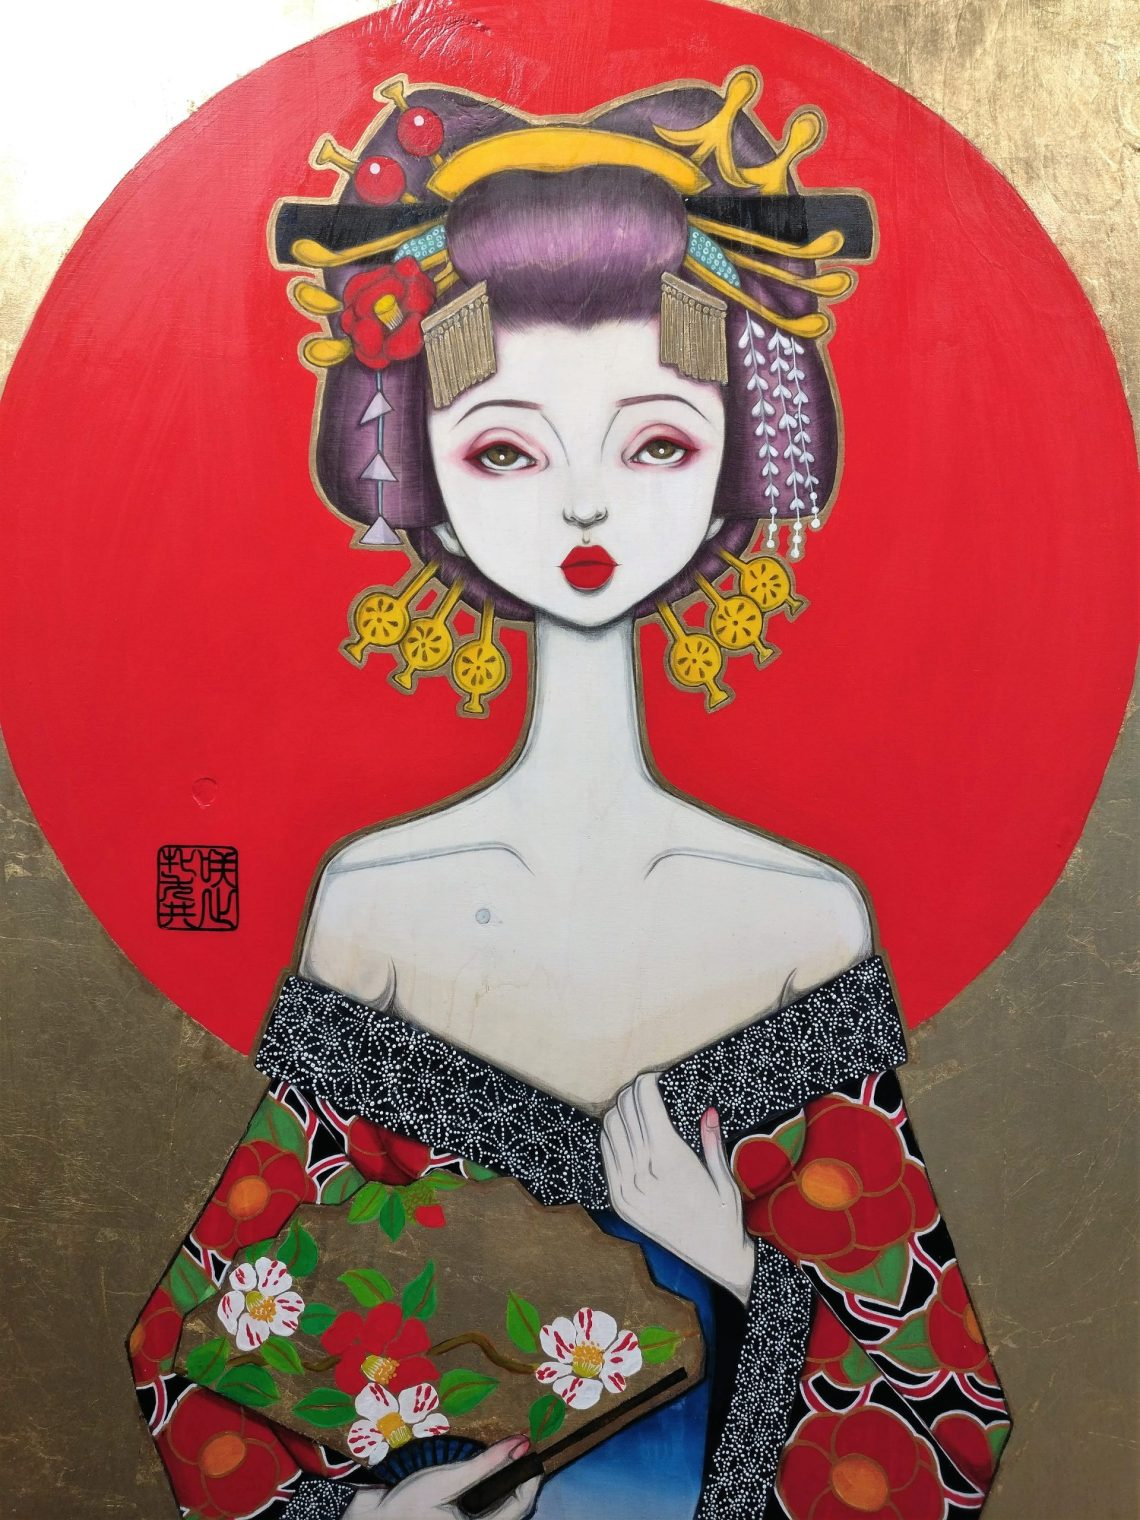 A Yujo painting by Saki & Bitches